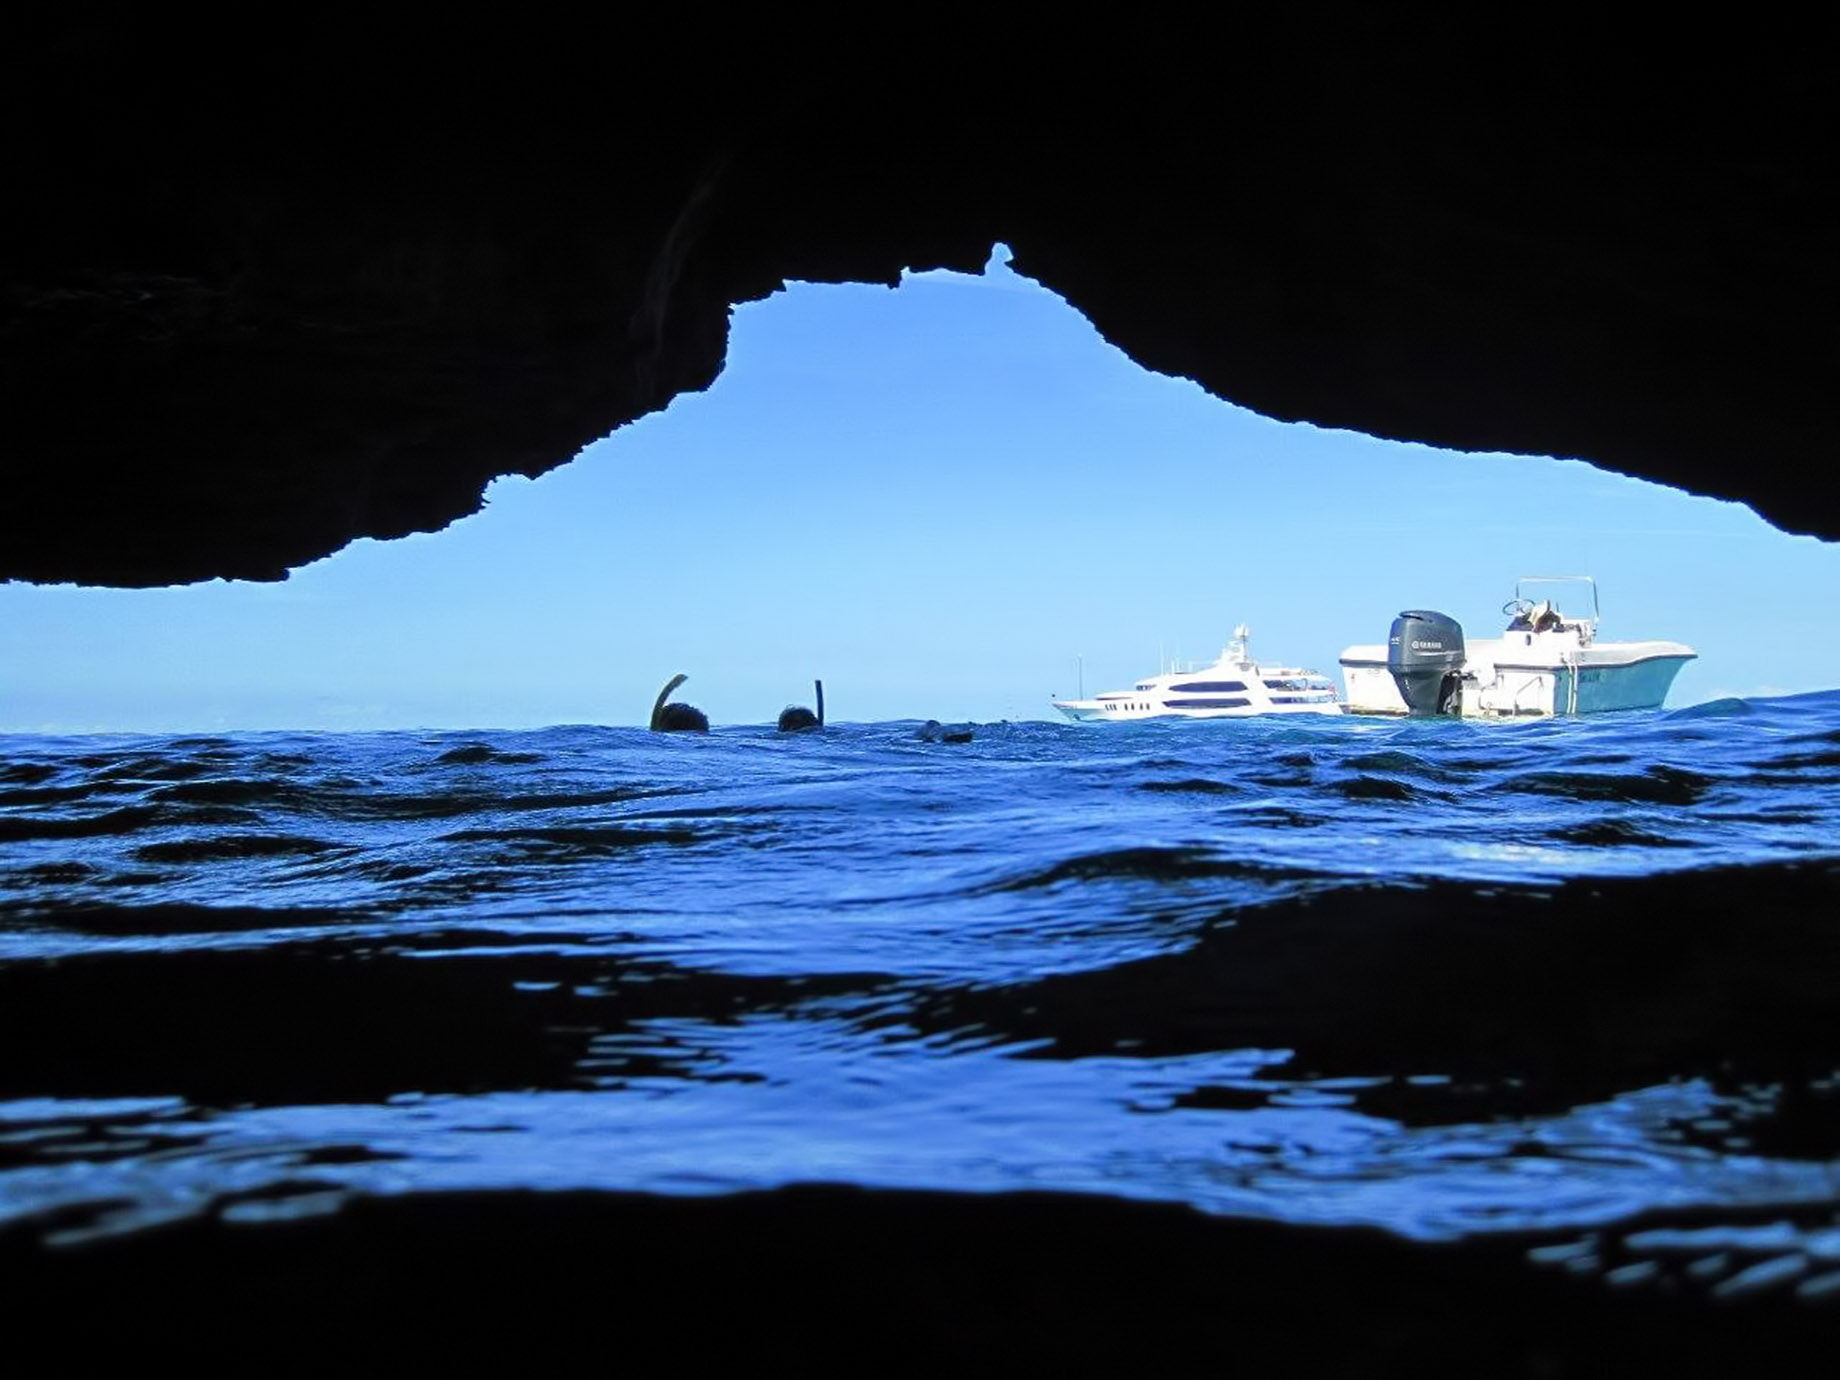 Visit Thunderball Grotto like James Bond – Take A Luxury Getaway To The Bahamas